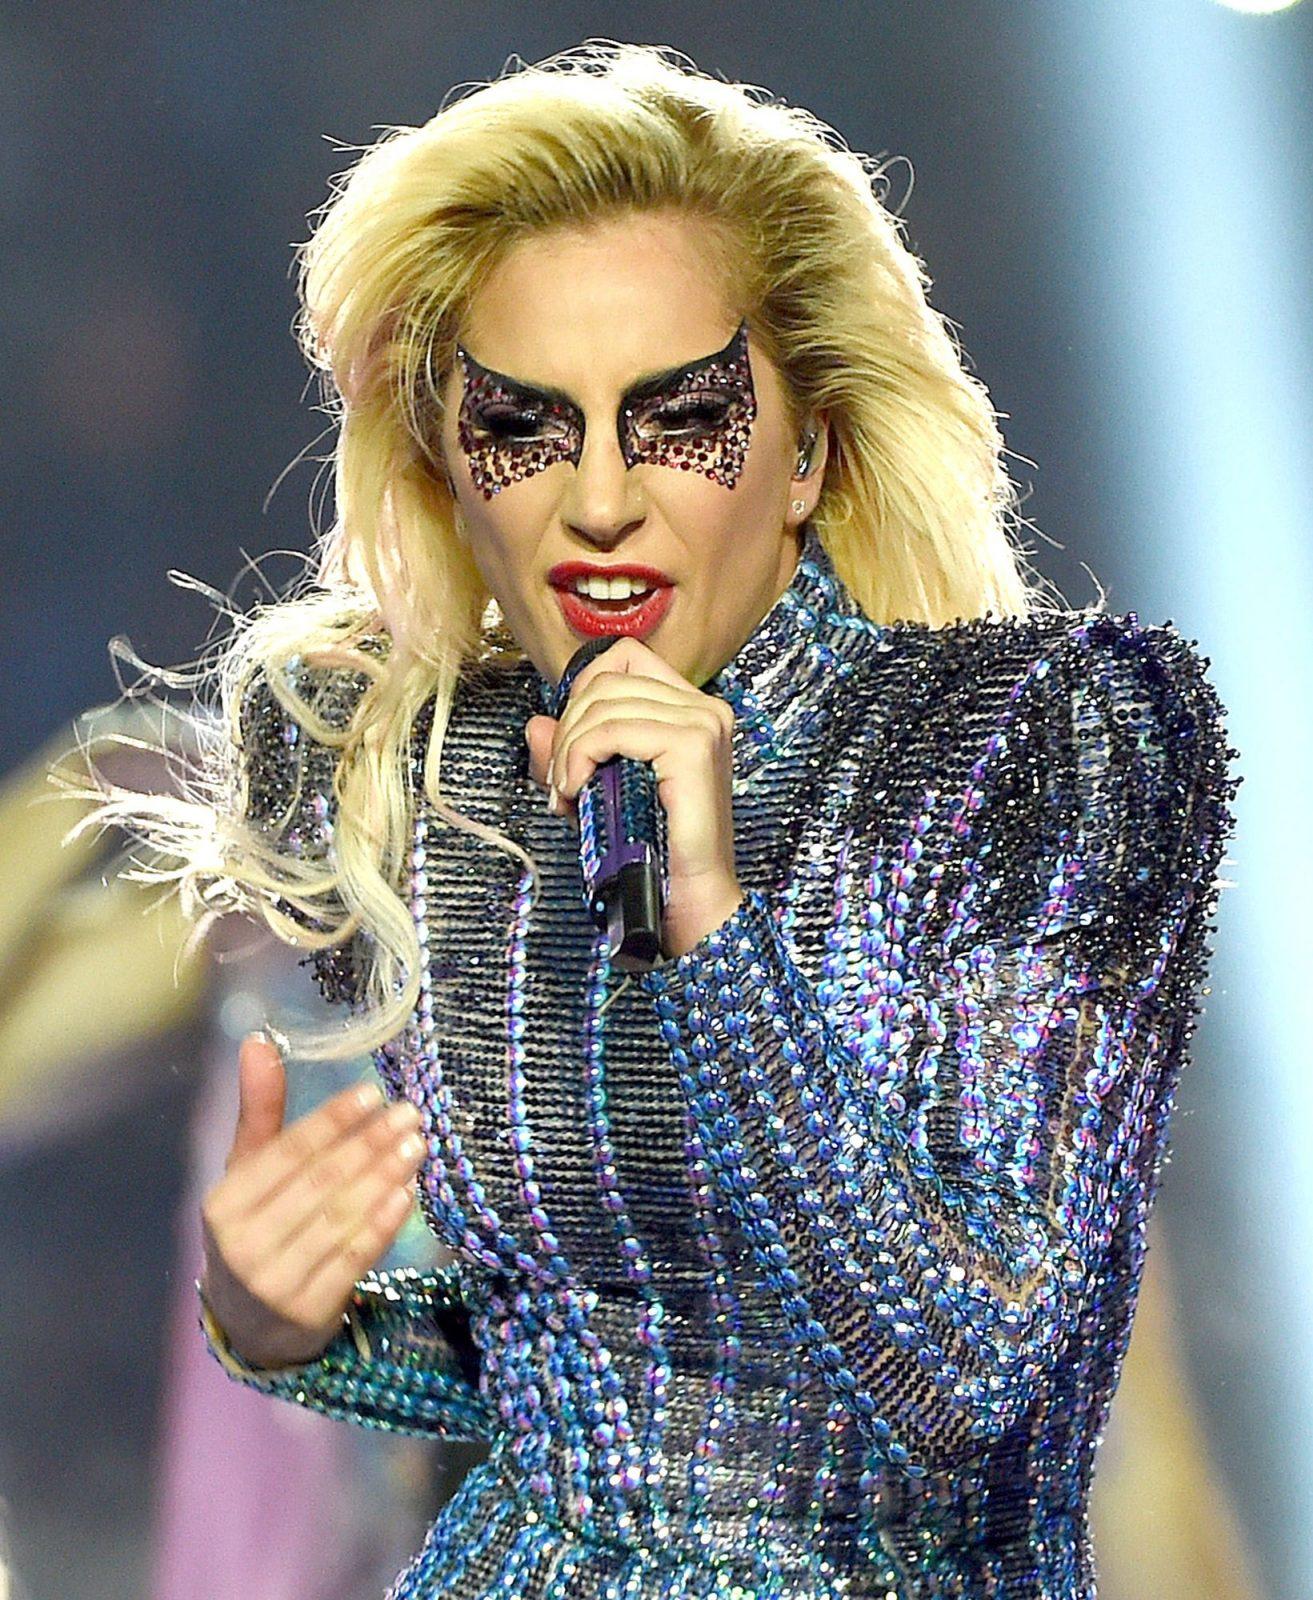 Super Bowl LI Halftime Show - Lady Gaga